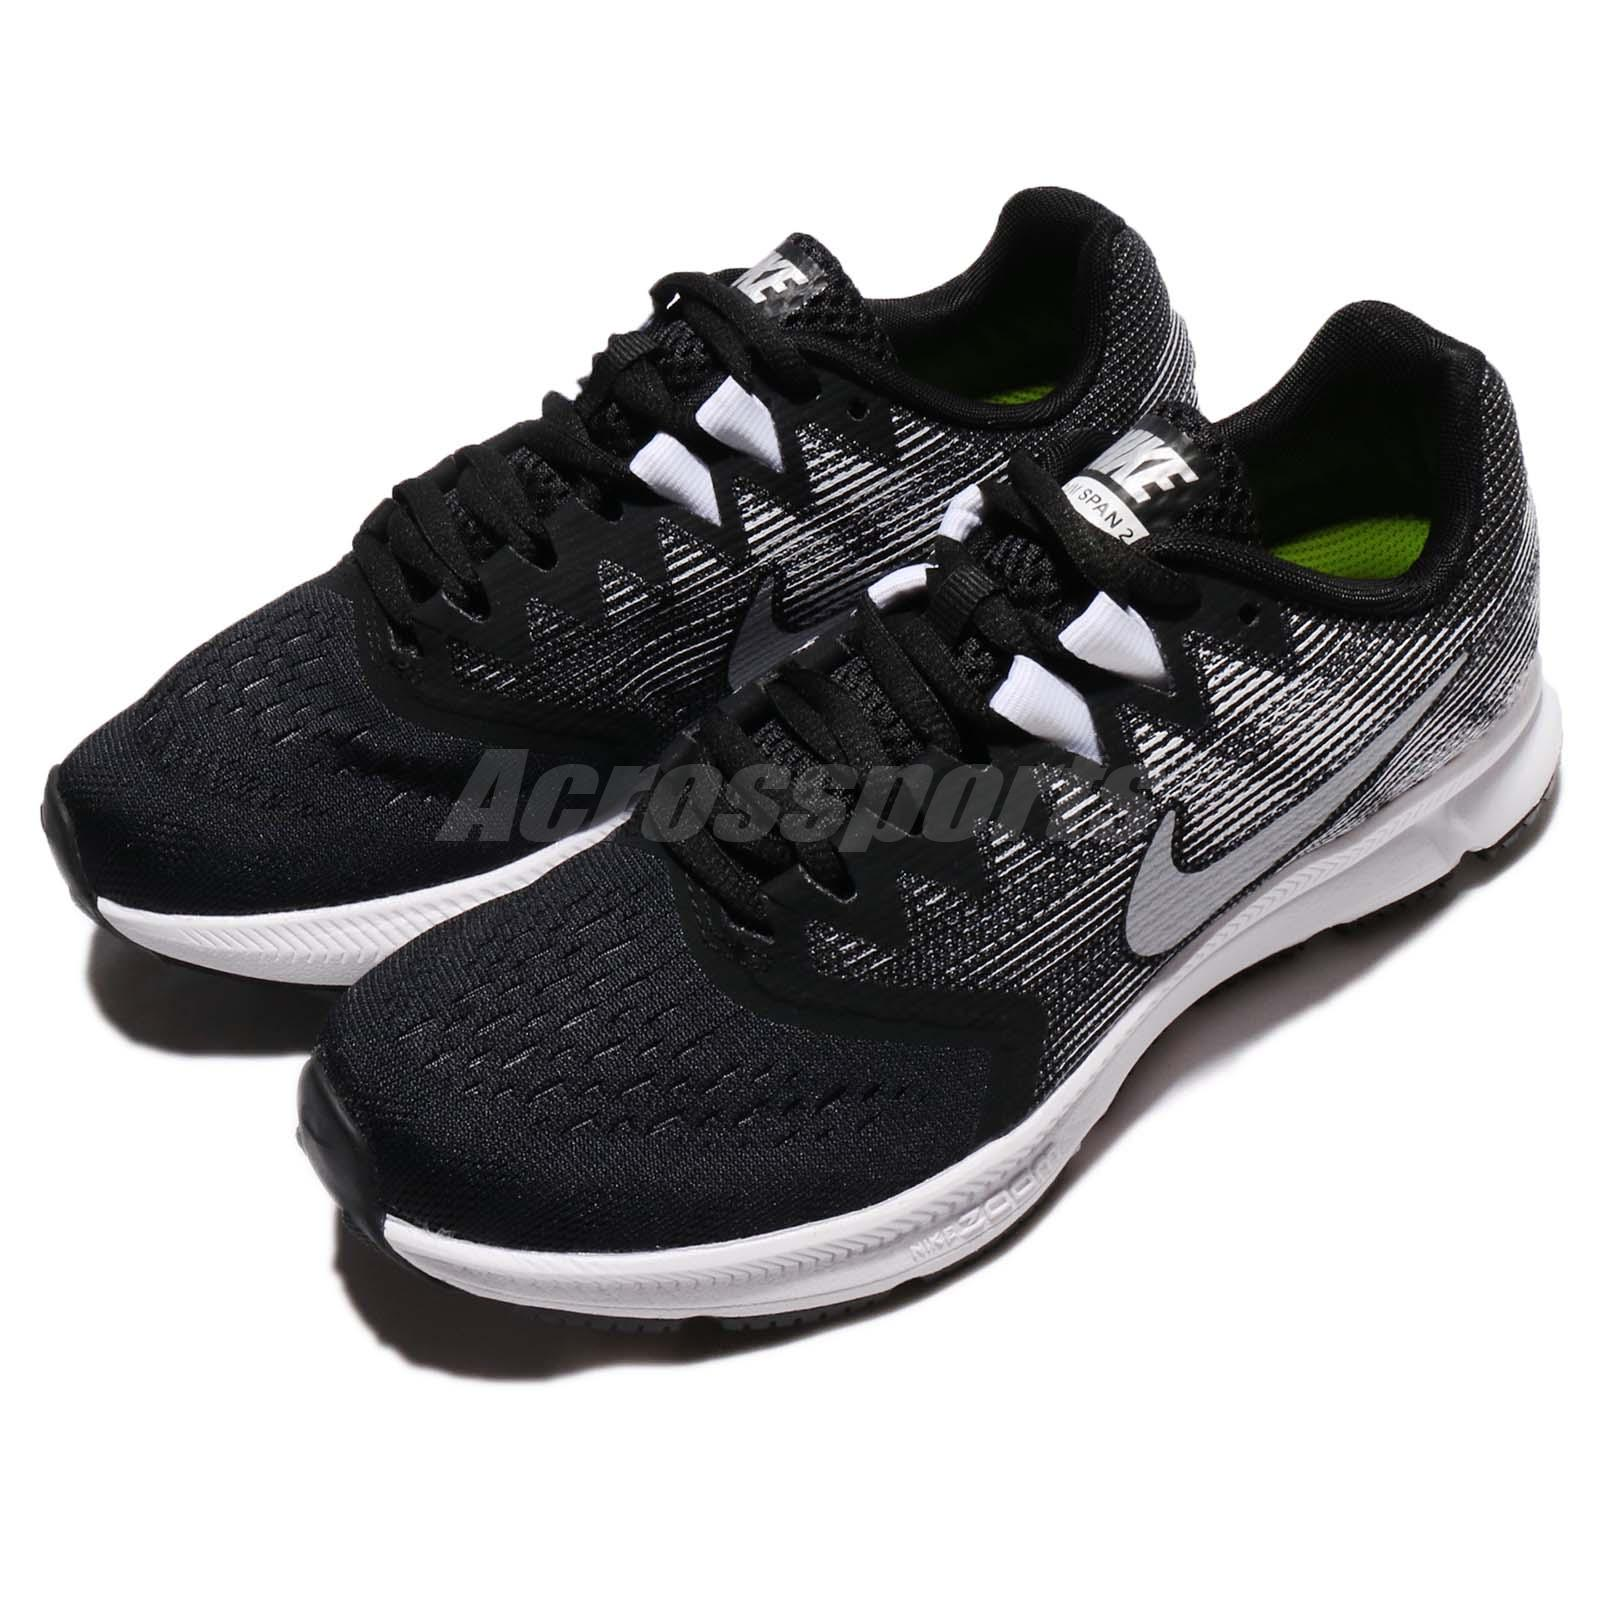 a70cd4325beb2 Wmns Nike Zoom Span 2 II Black Metallic Silver Women Running Shoes ...